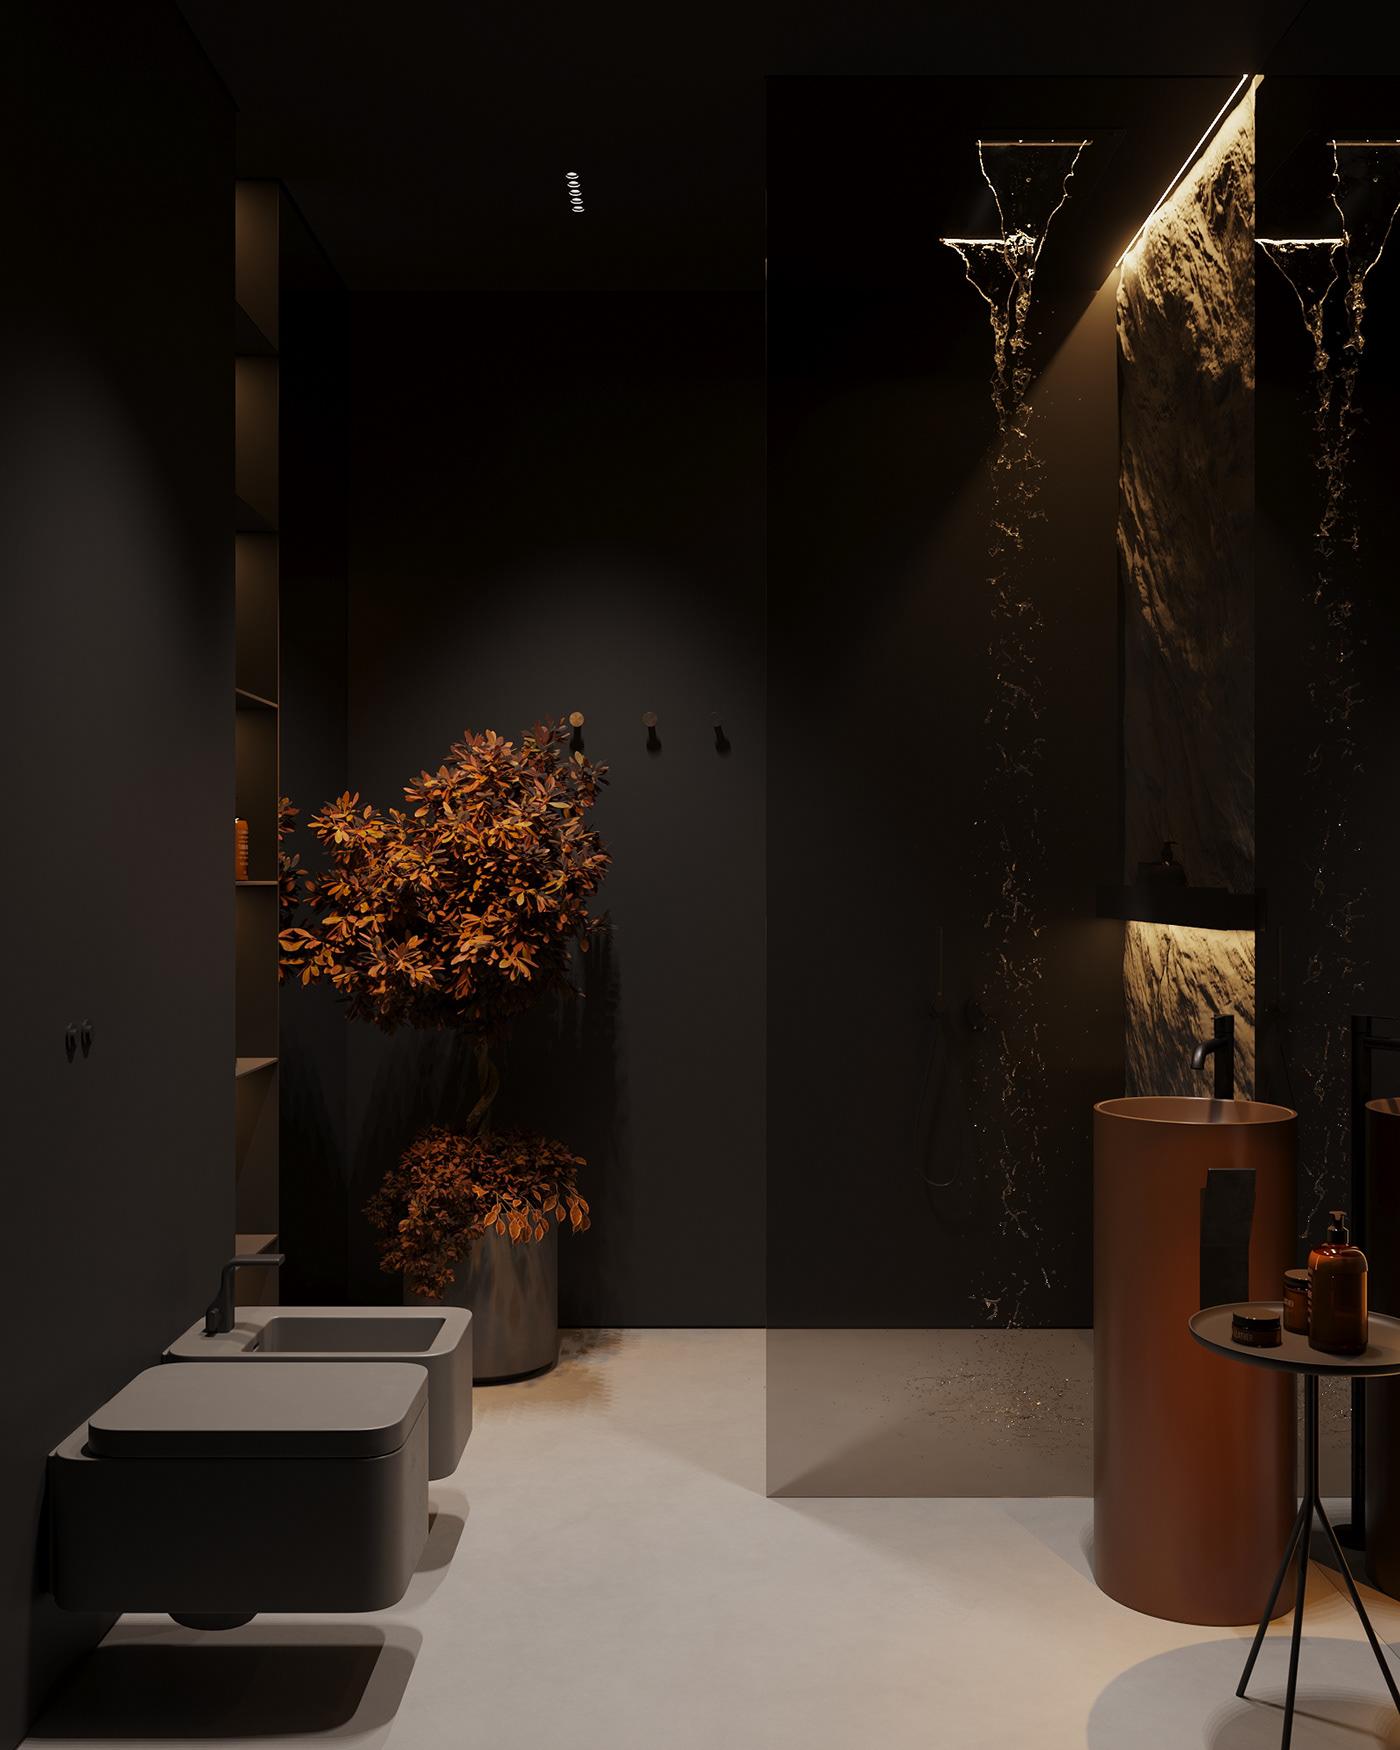 3dsmax CGart corona render  designinspiration designinterior Interior interior design  Minimalism Render rendering